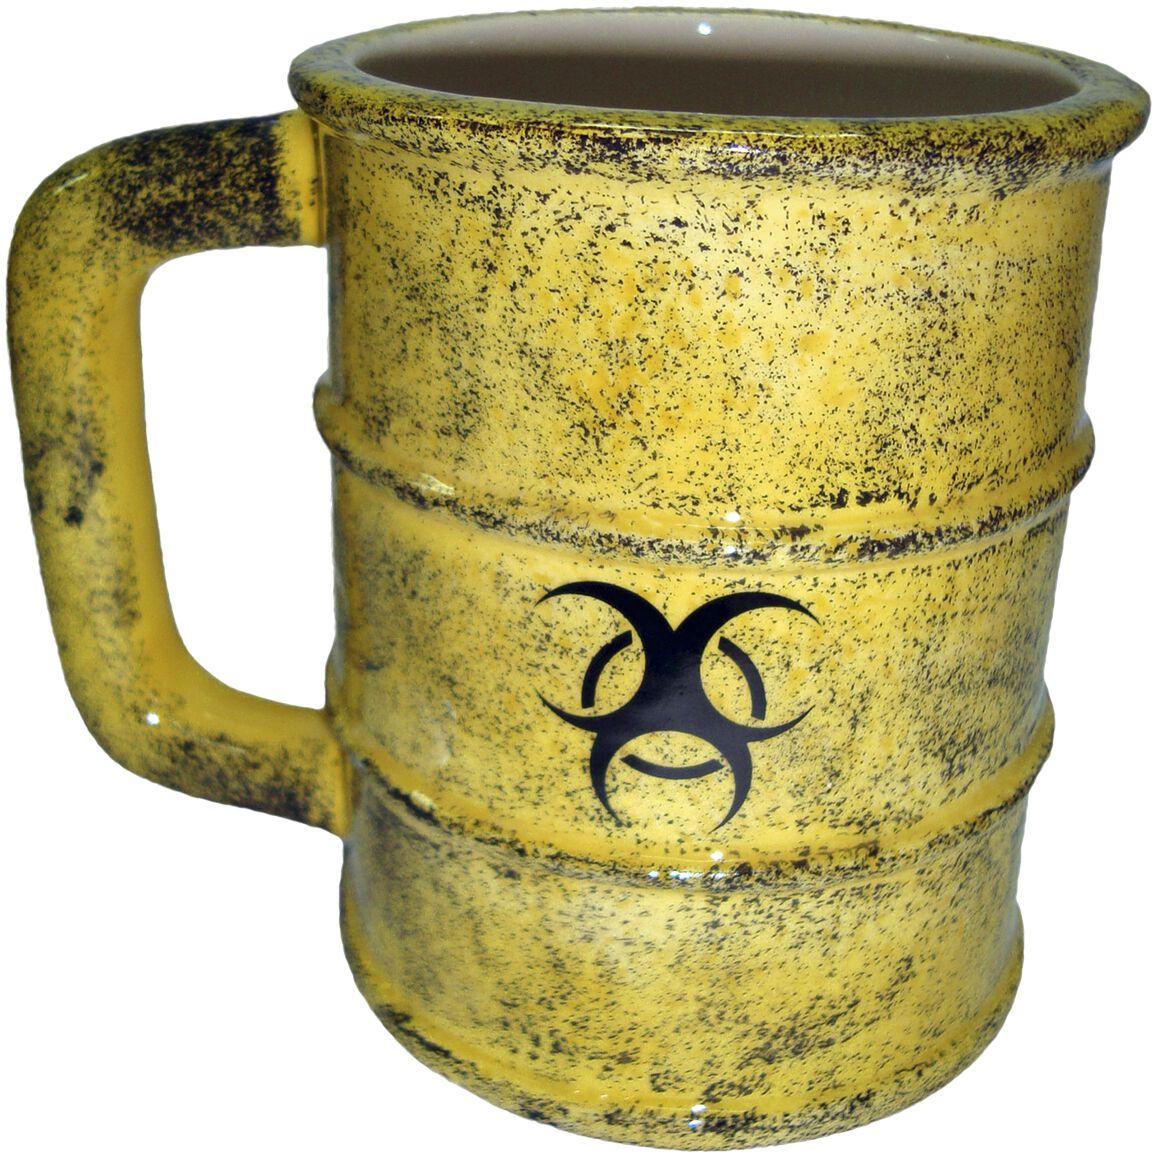 Image of   Nemesis Now Toxic Waste Mug Krus gul